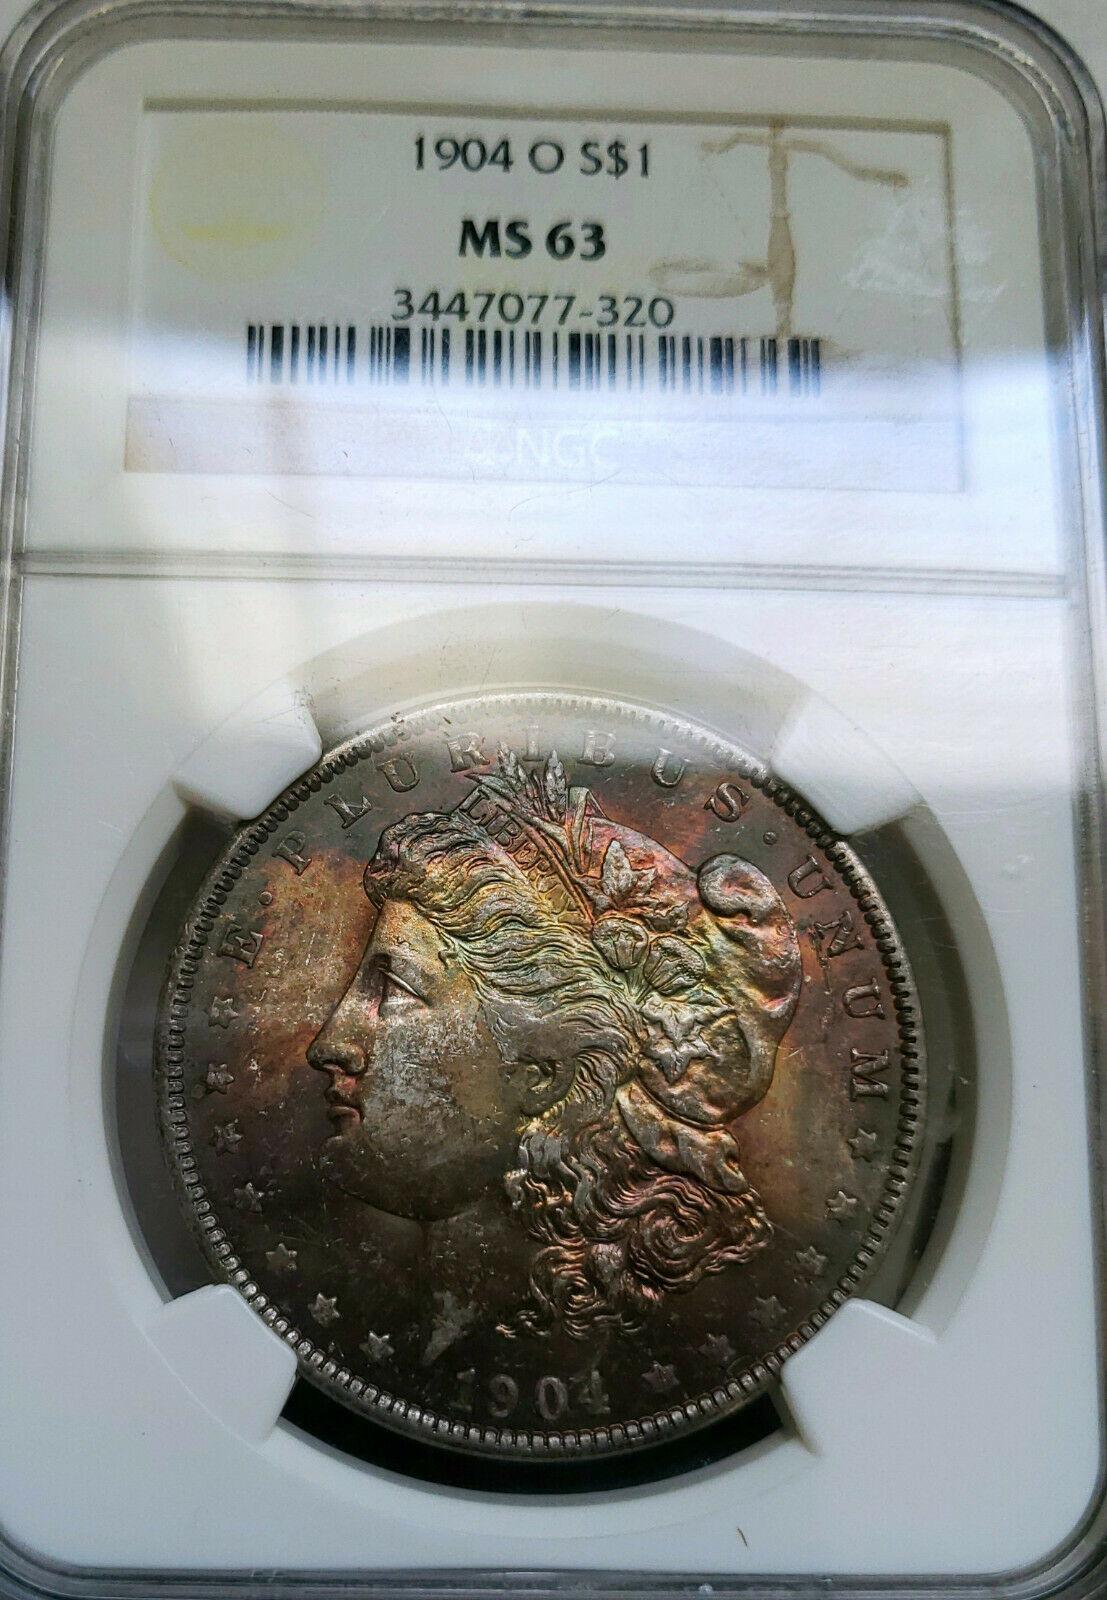 ~☆DARK RAINBOW☆~ 1904-O MS-63 Morgan Silver Dollar NGC GORGEOUS COIN!